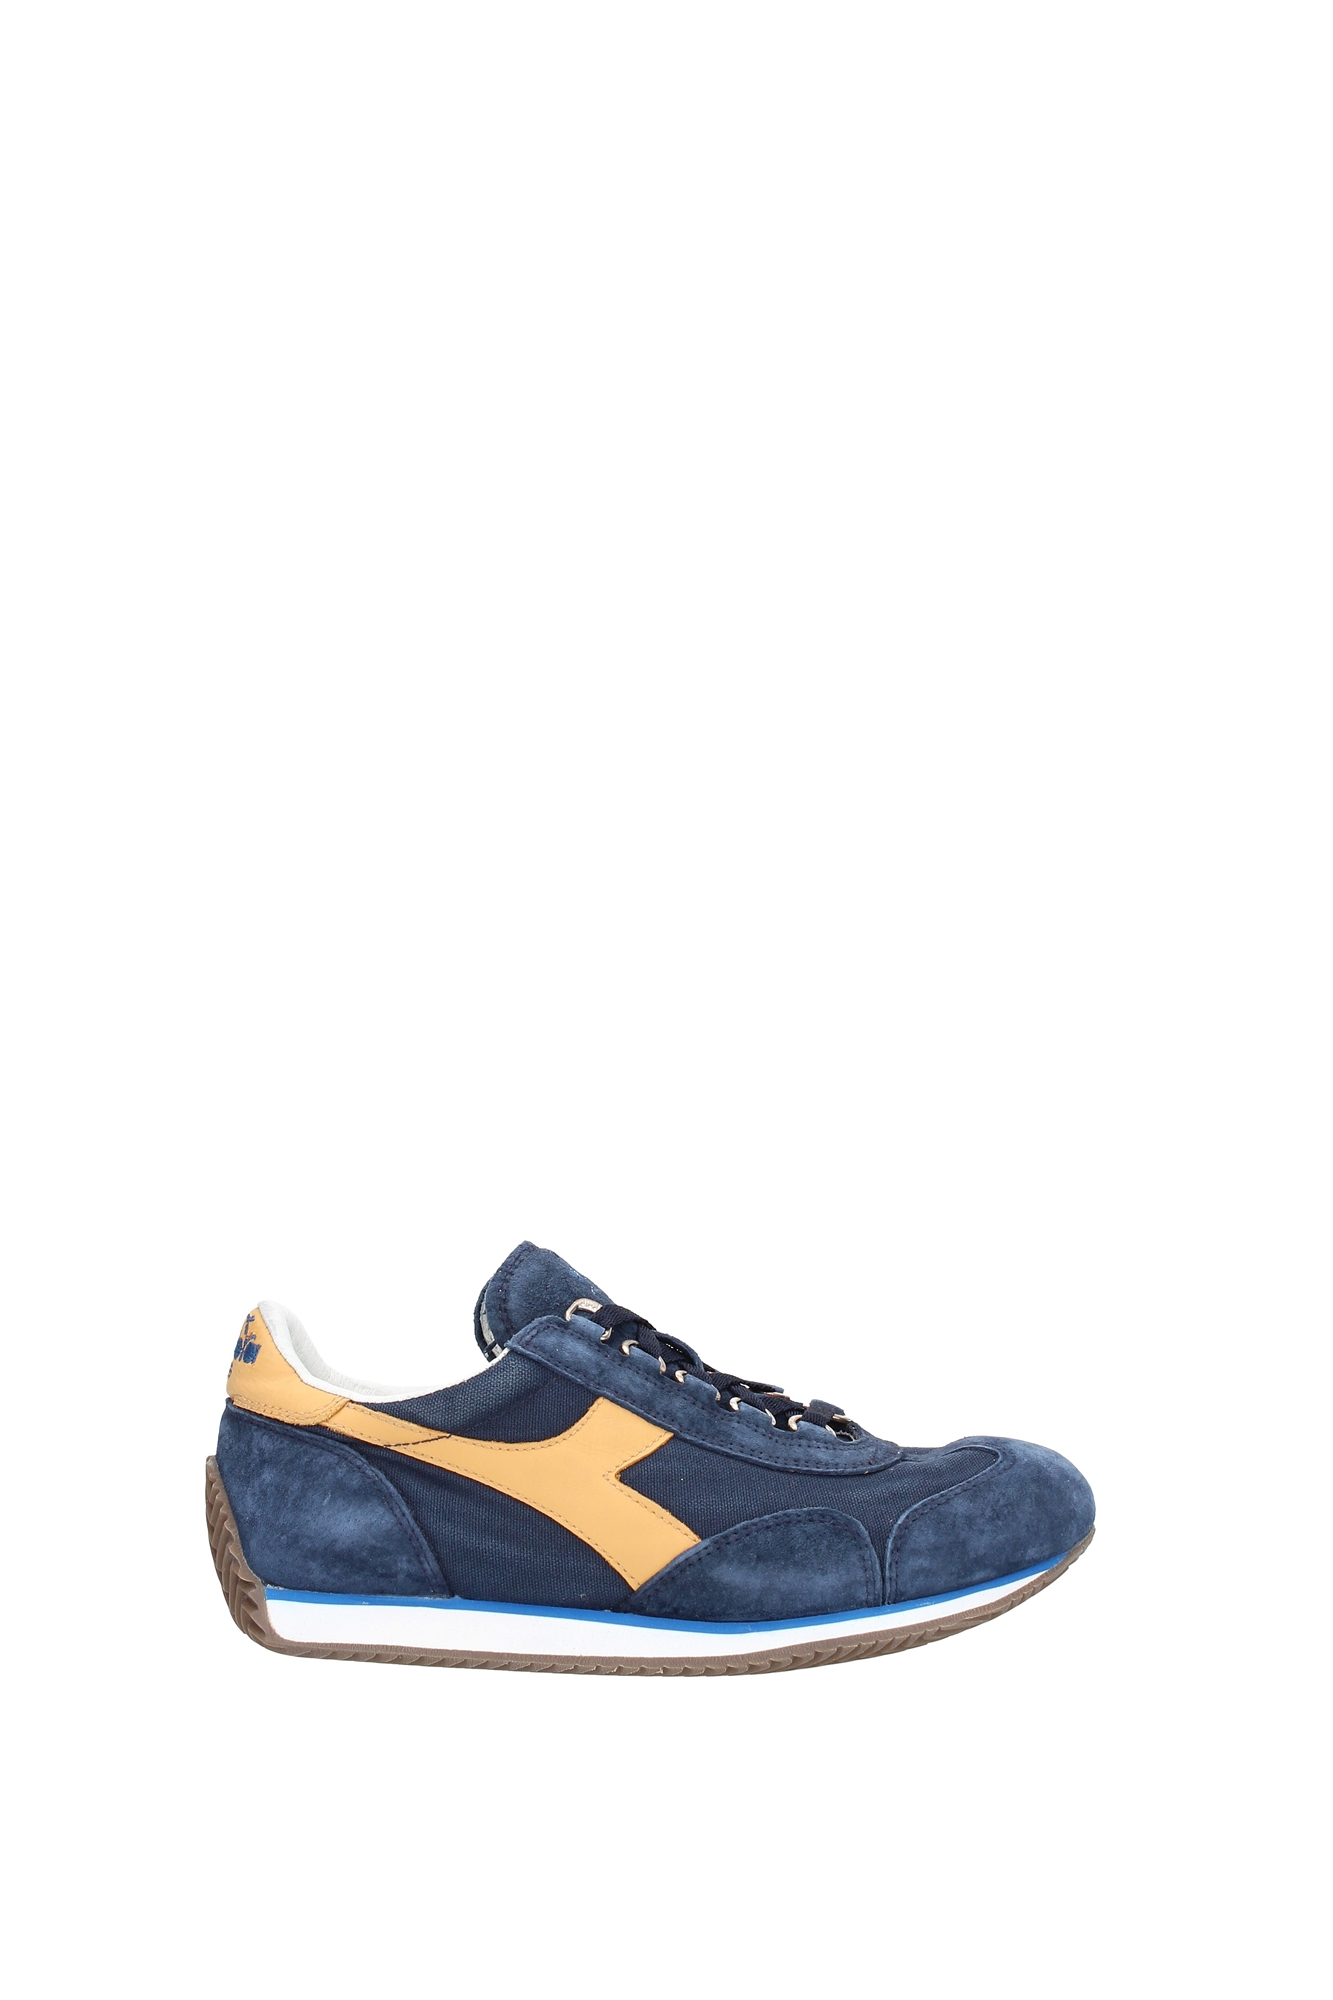 Sneakers-Diadora-Heritage-Women-201156988C6146